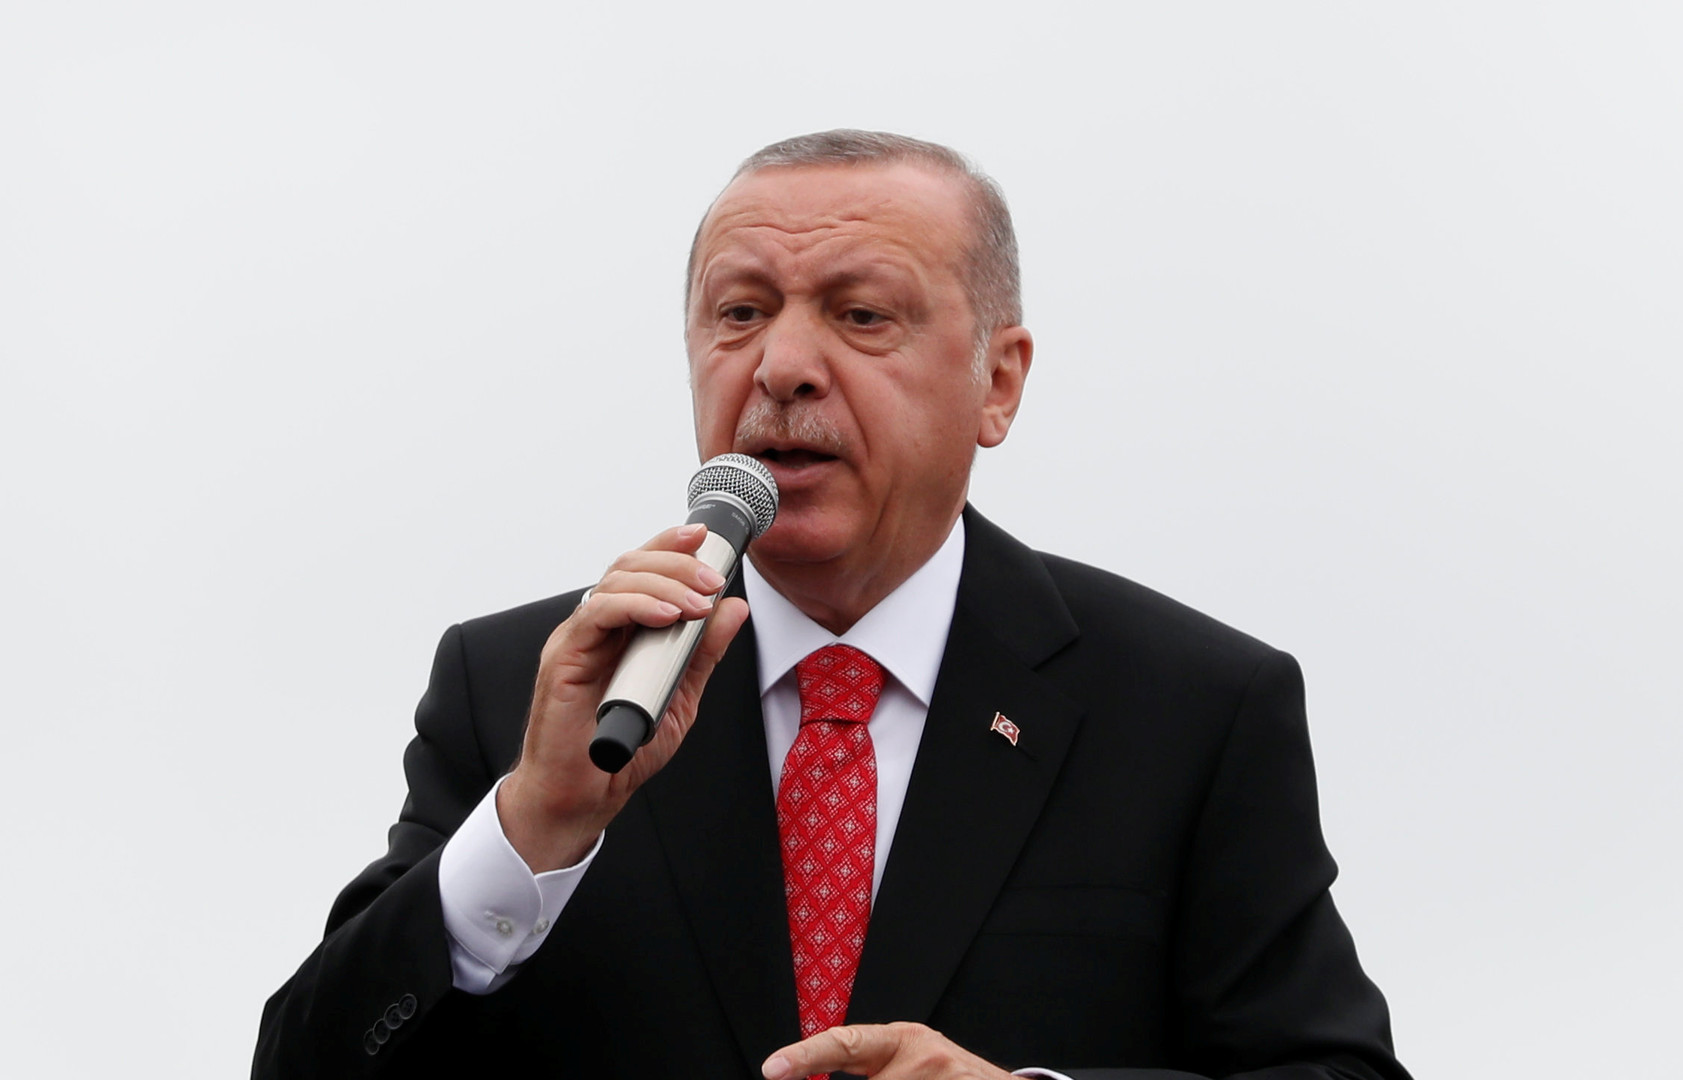 أردوغان: صفقة شراء منظومات